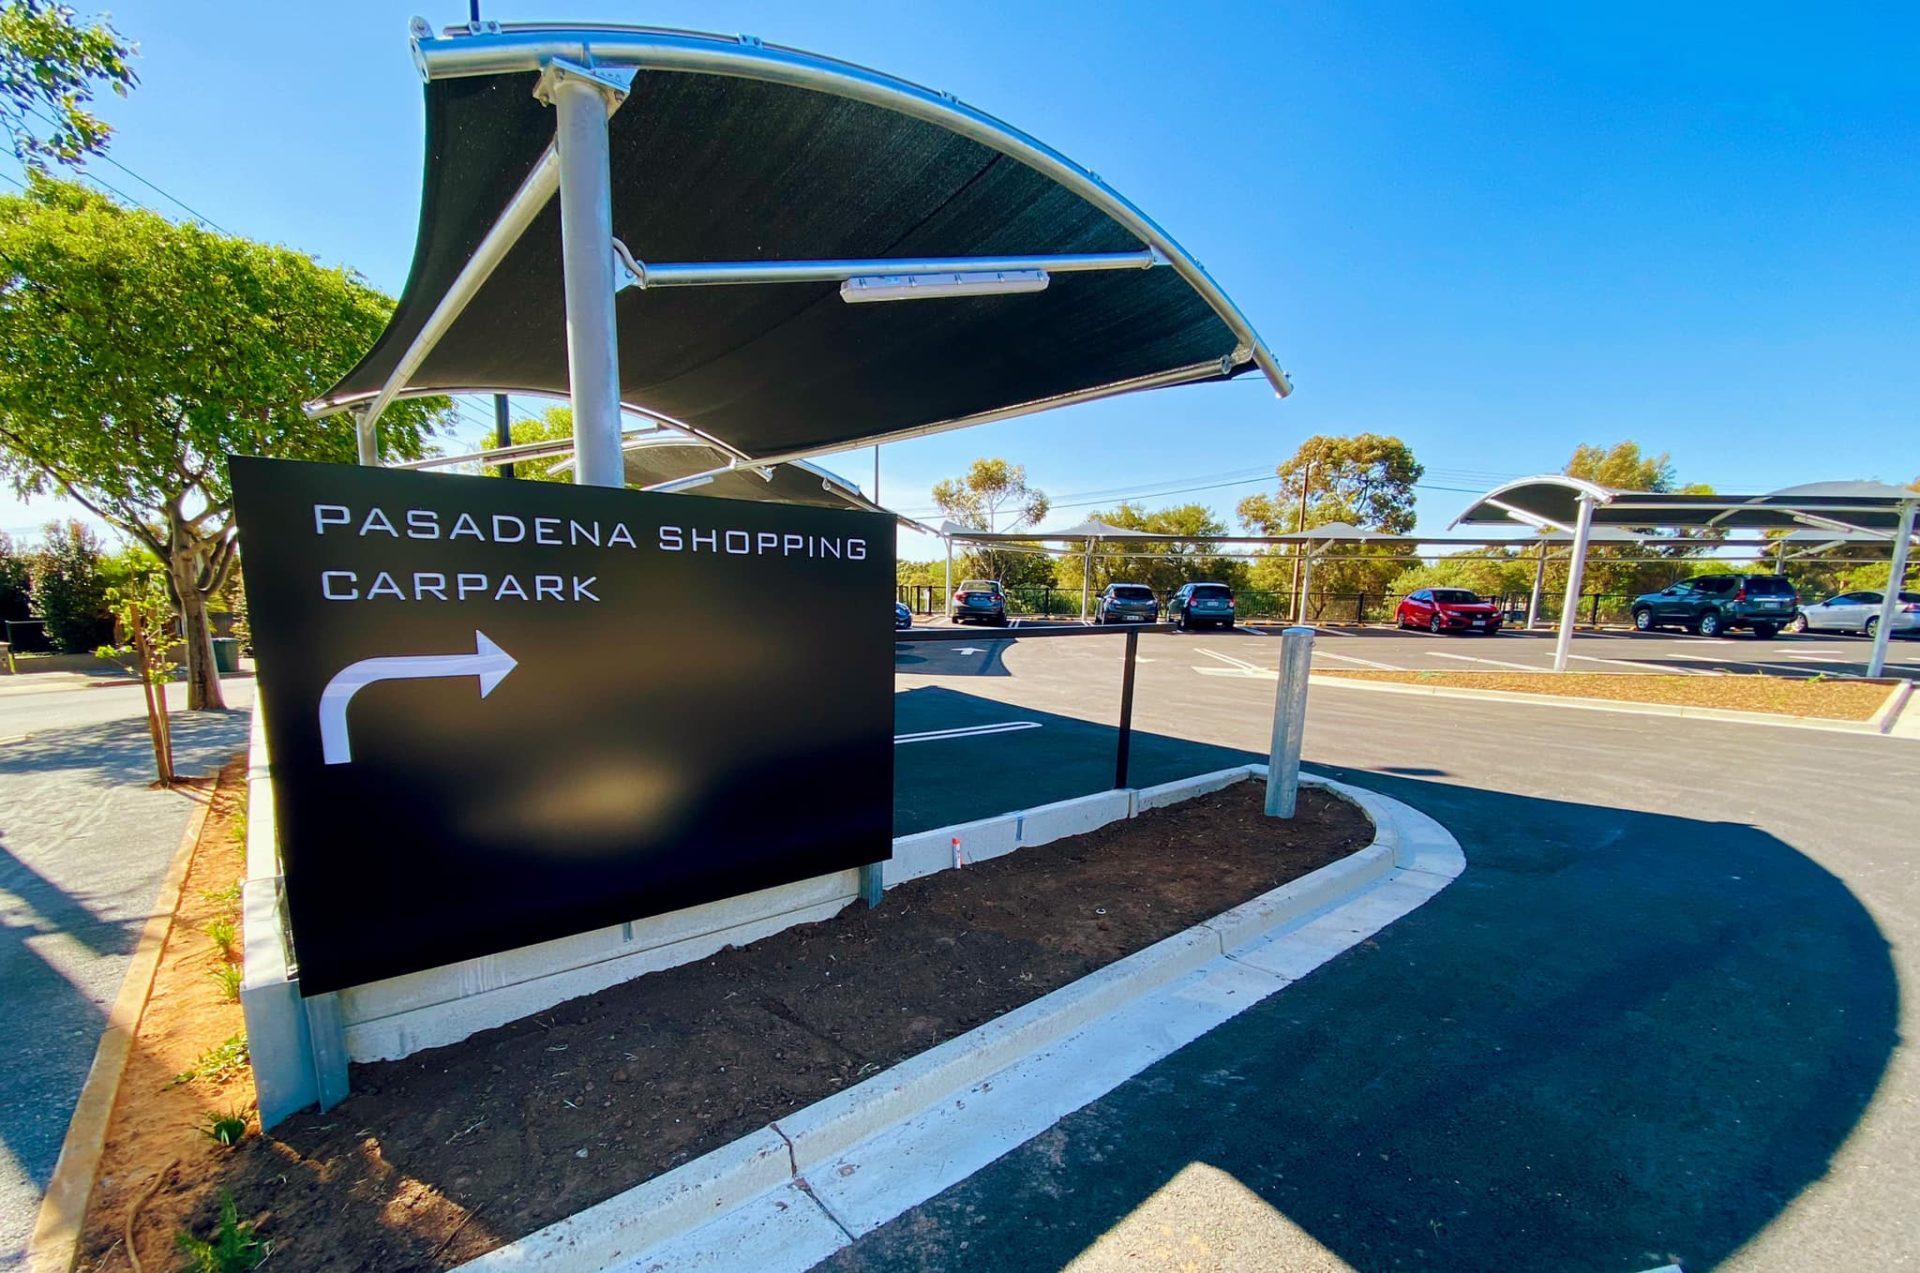 NEW Carpark